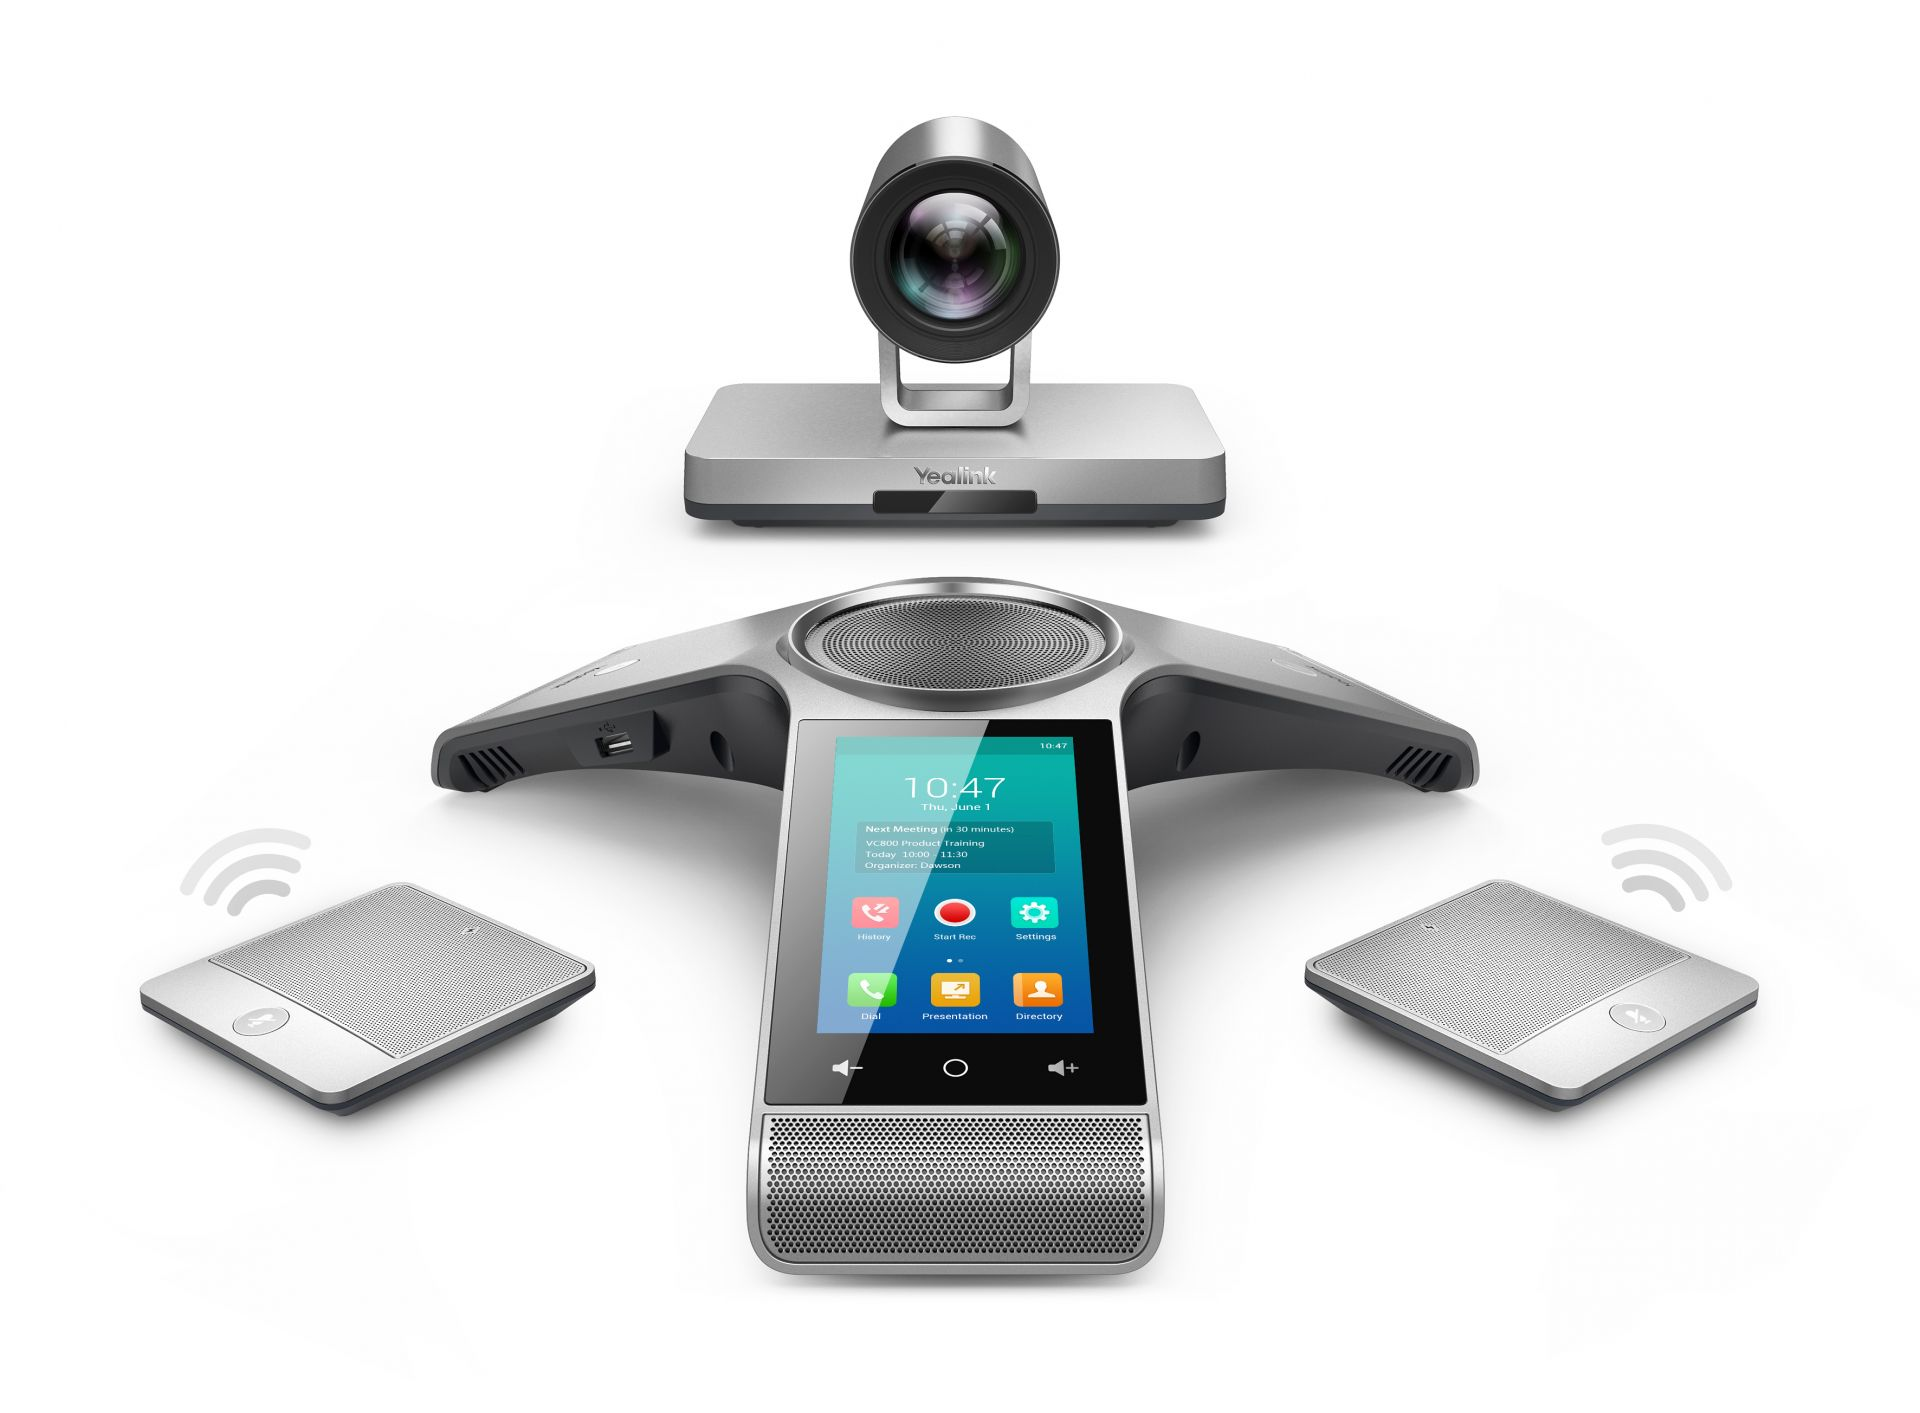 Yealink VC800 Video Konferenzsystem wireless